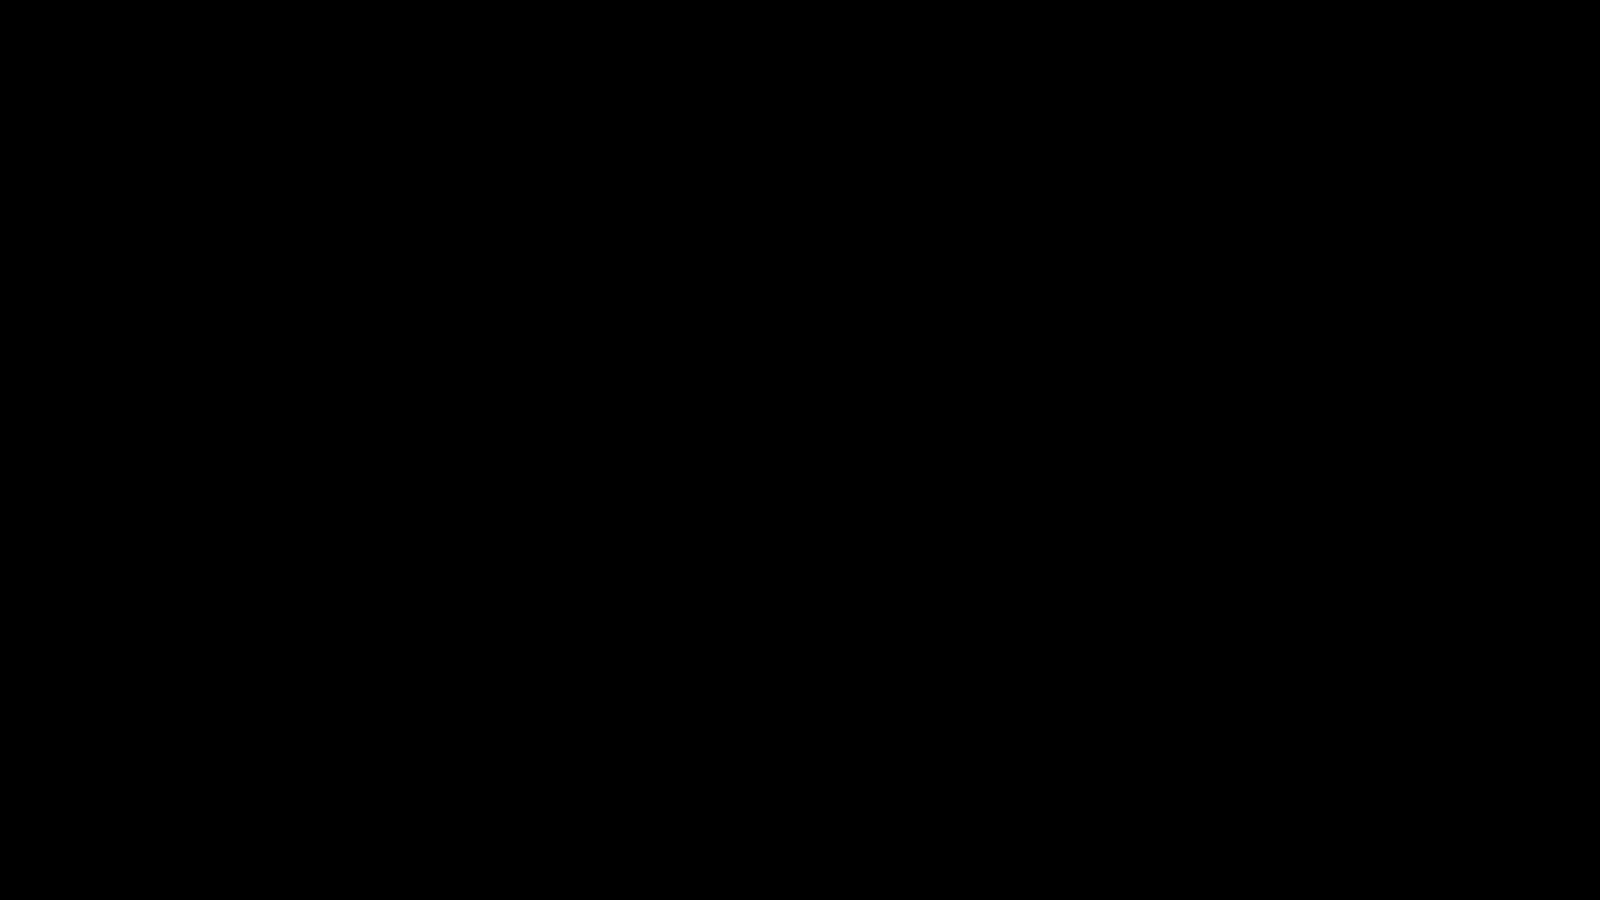 Silhueta invertida - Borboleta PNG